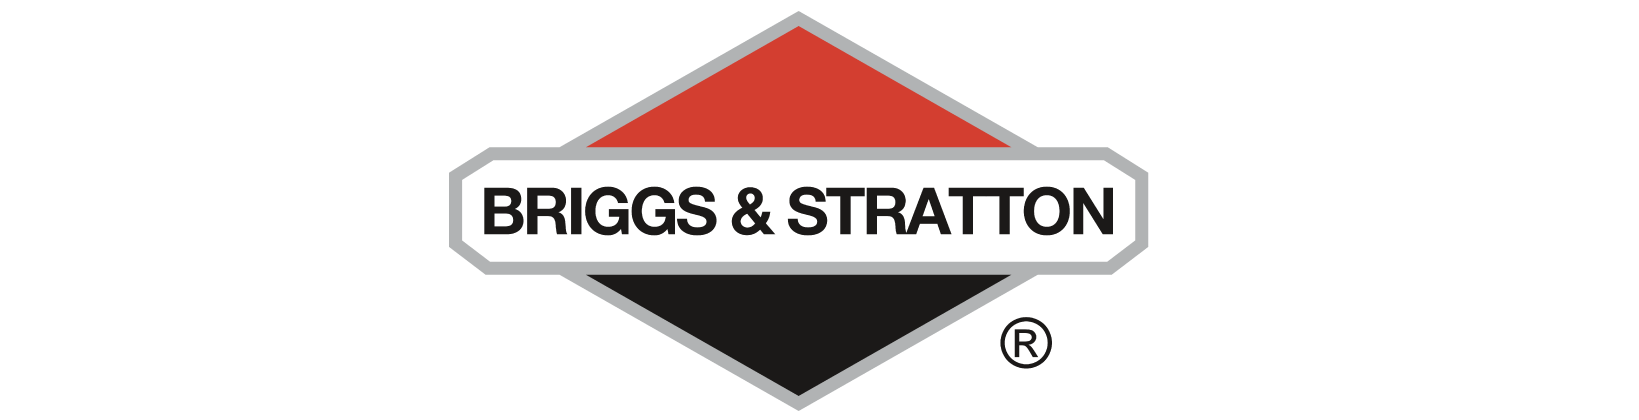 fredensborg_skov_have_leverandører_Briggs-Stratton